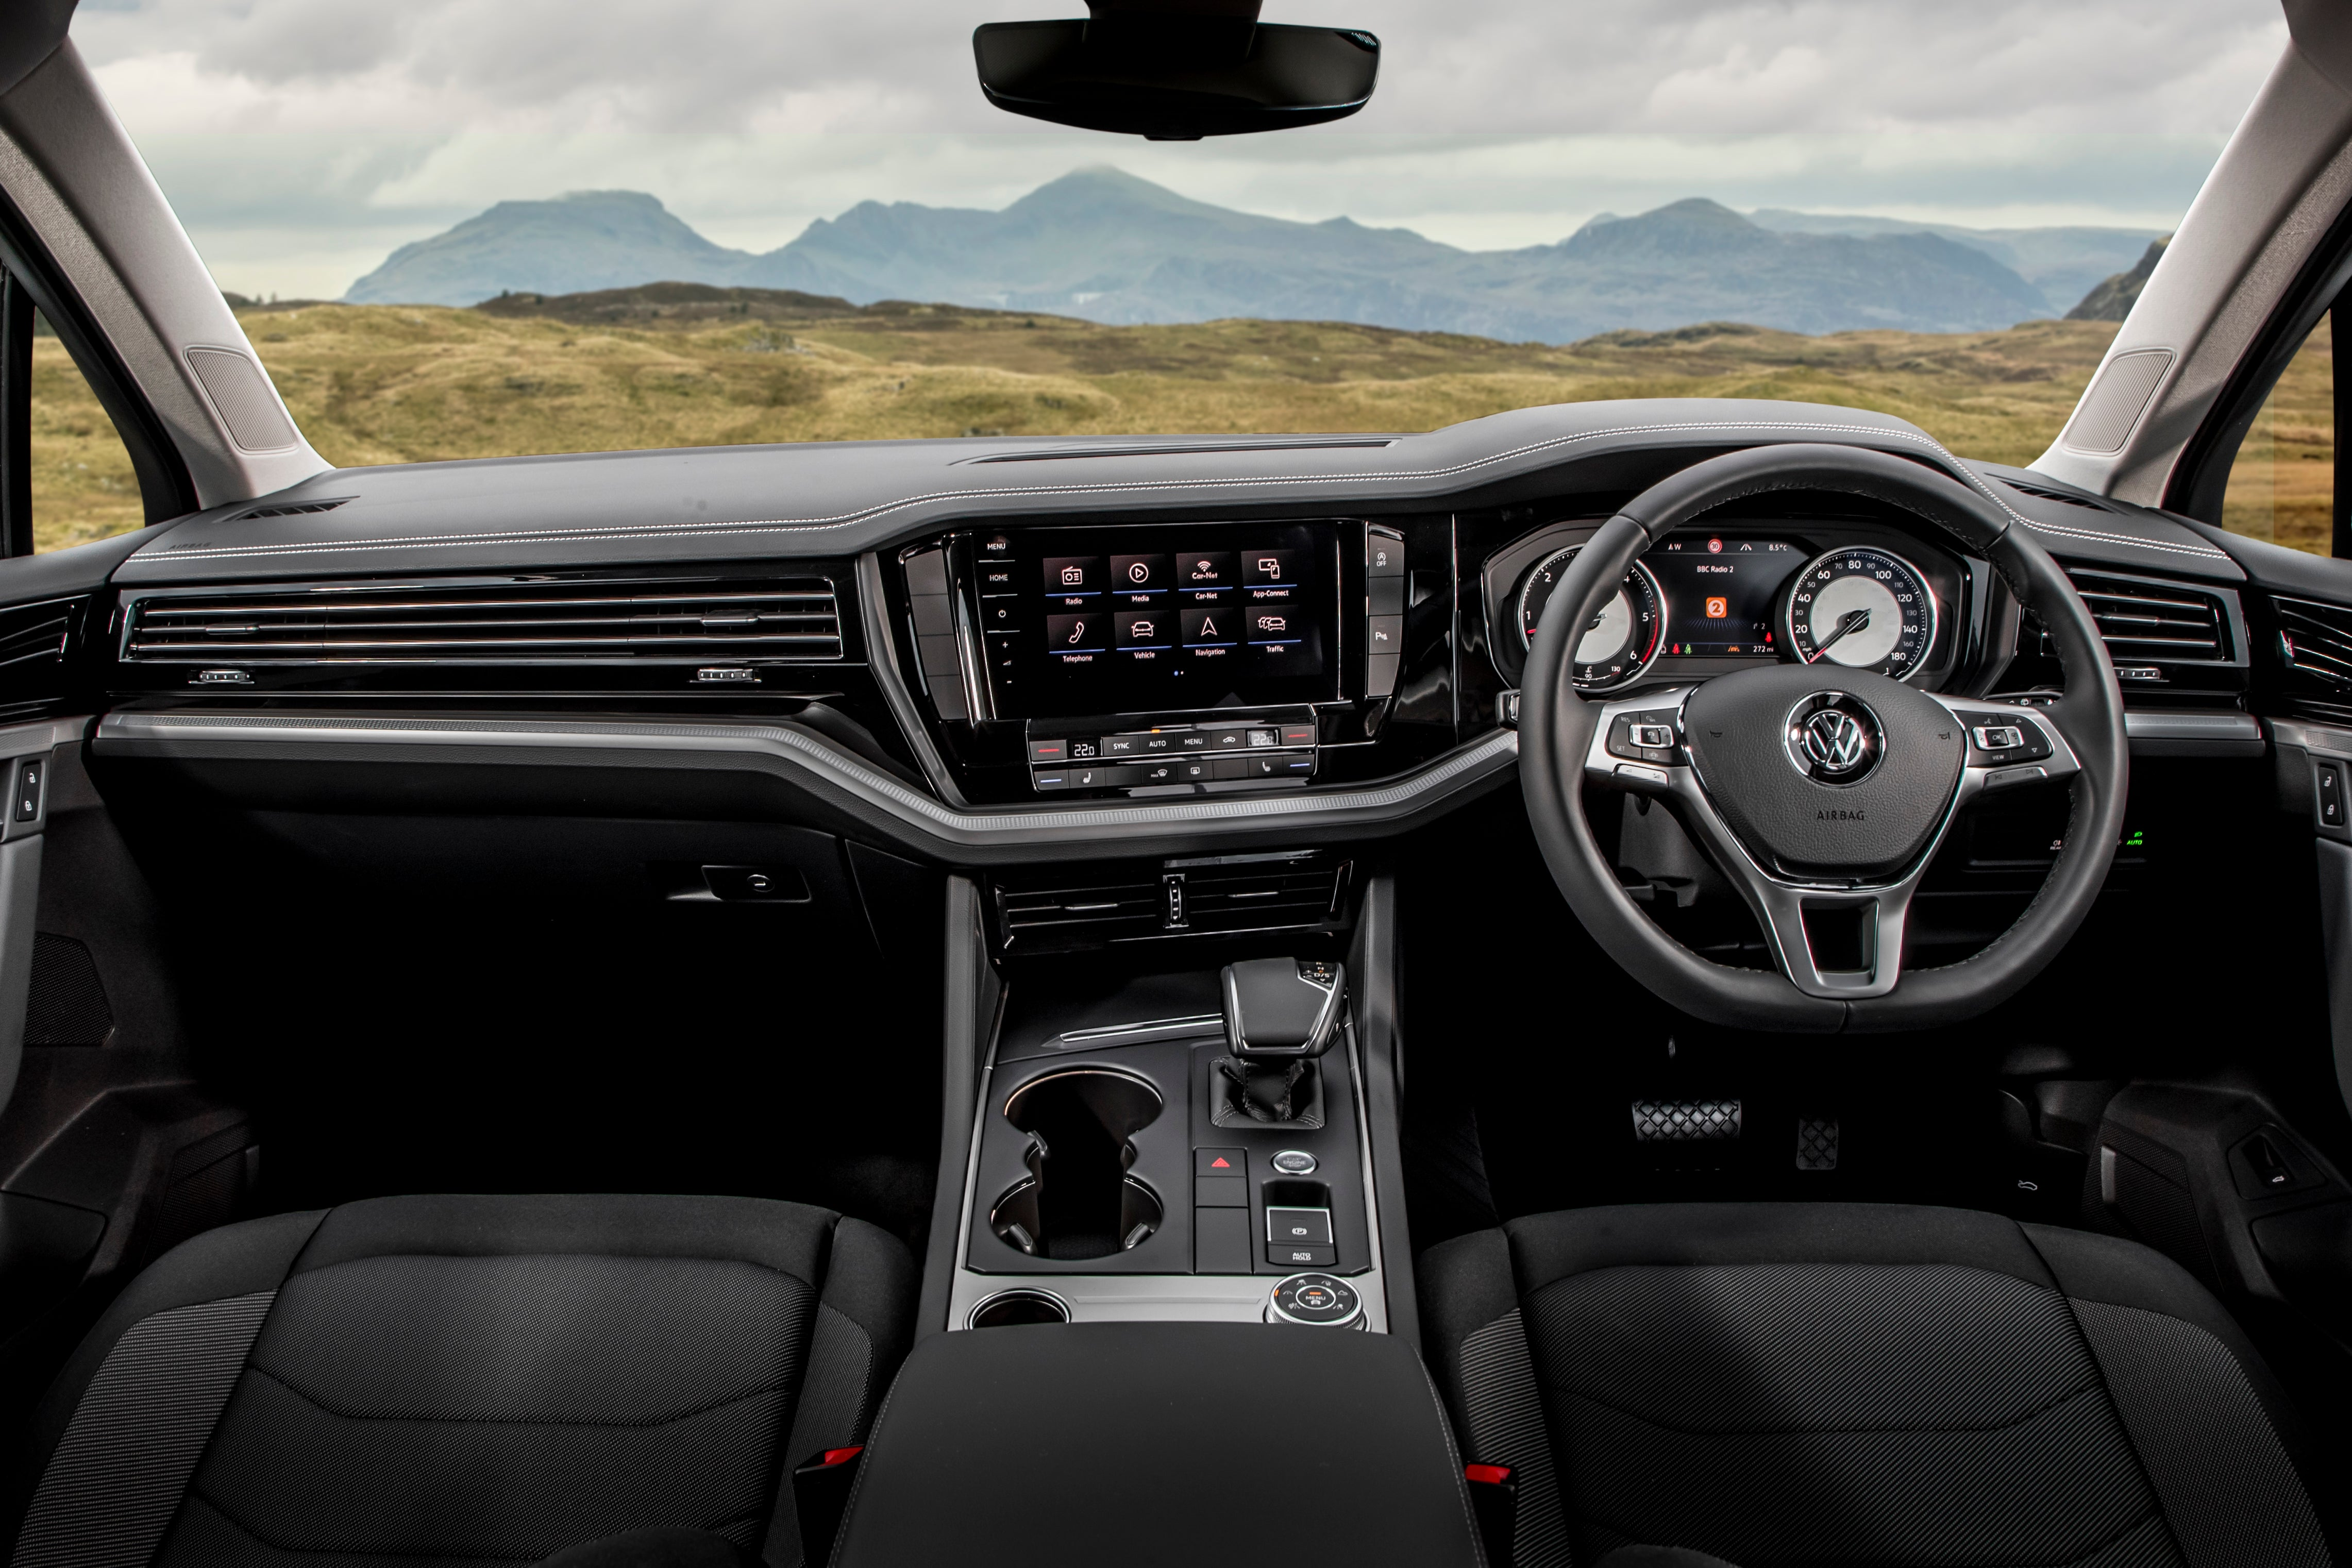 Volkswagen Touareg Front Interior